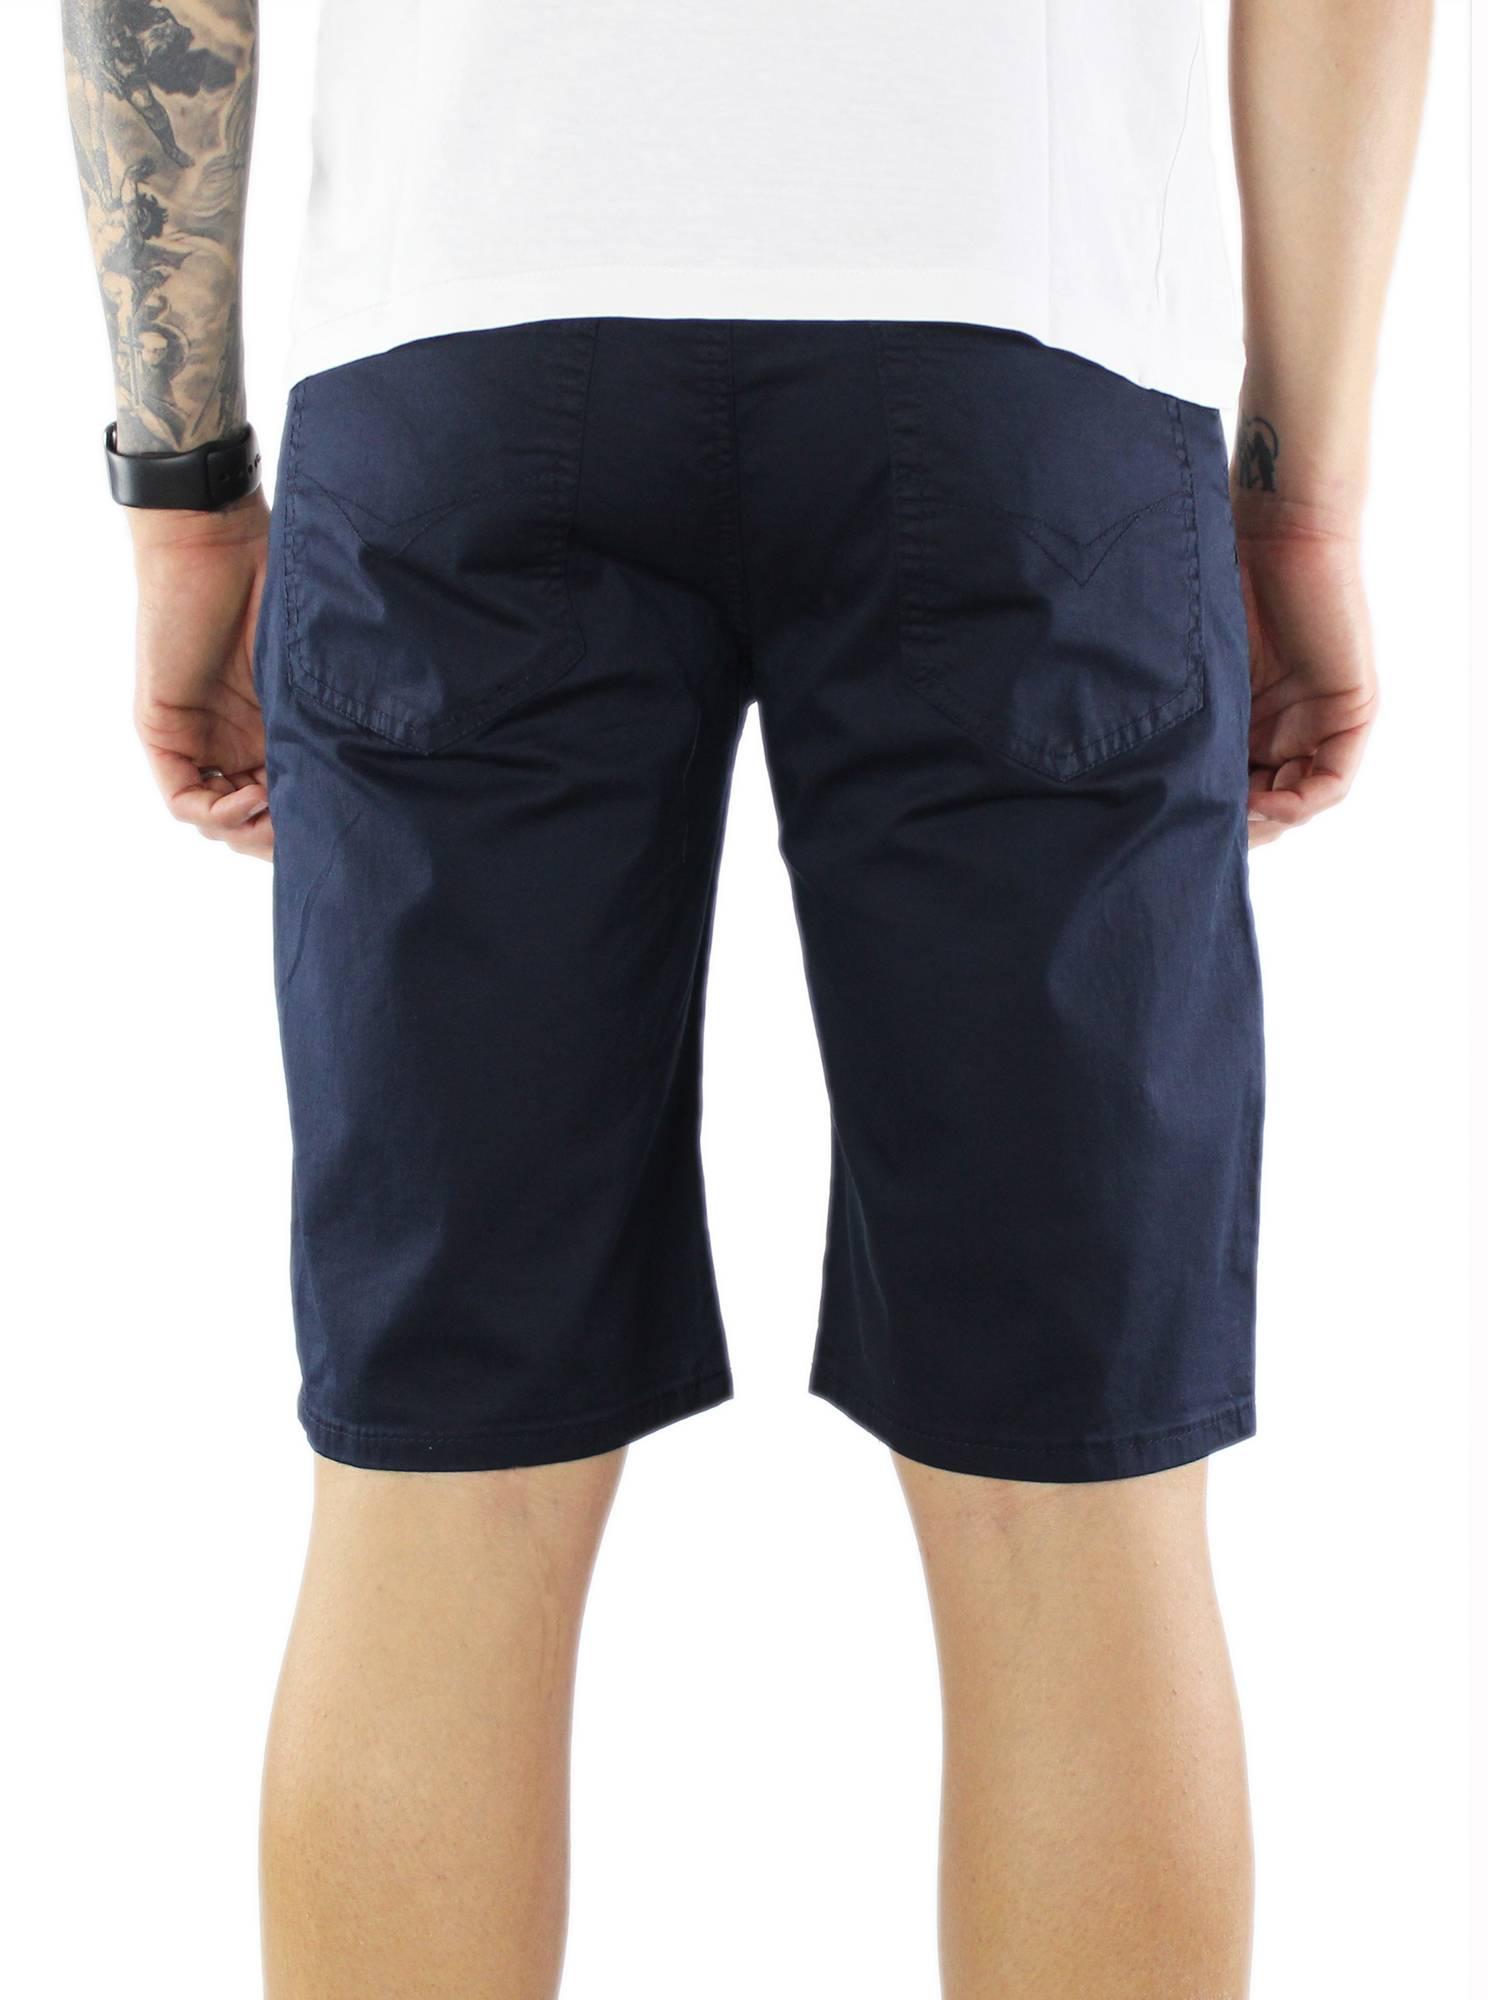 Bermuda-Uomo-Cotone-Slim-Fit-Pantalone-Corto-Shorts-Pantaloncini-Casual miniatuur 10